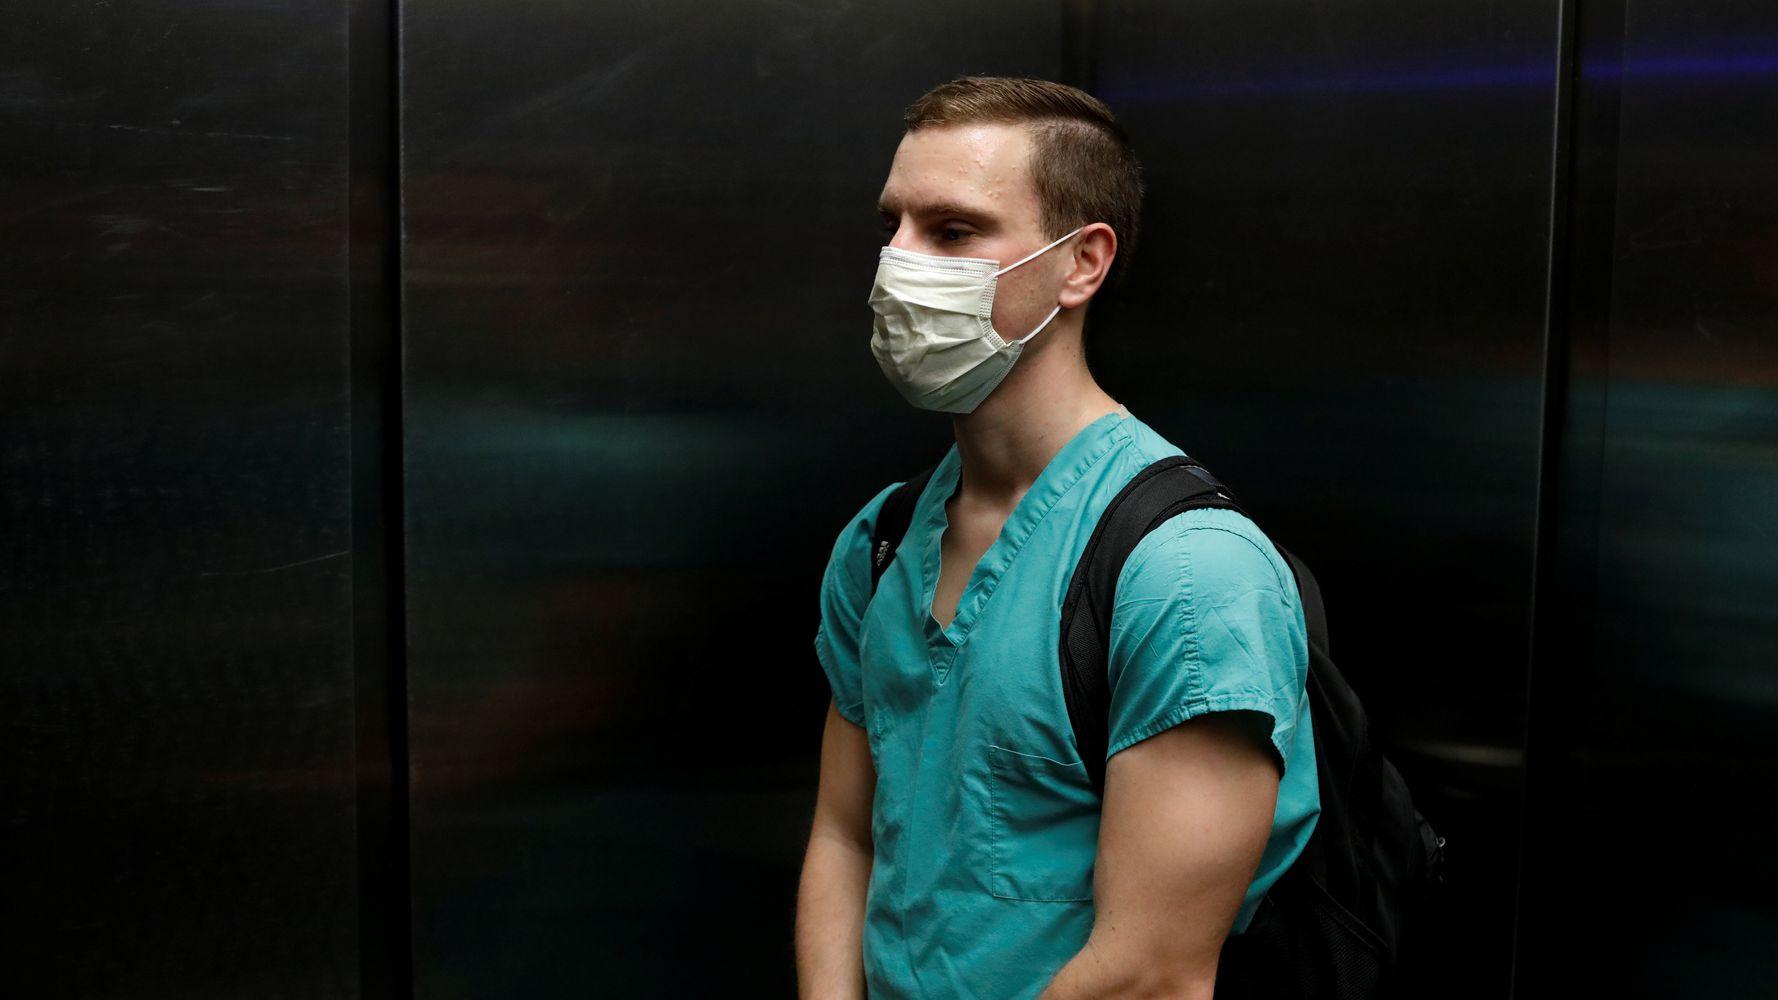 Miami Doctors Feel Helpless As COVID-19 Devastates South Florida